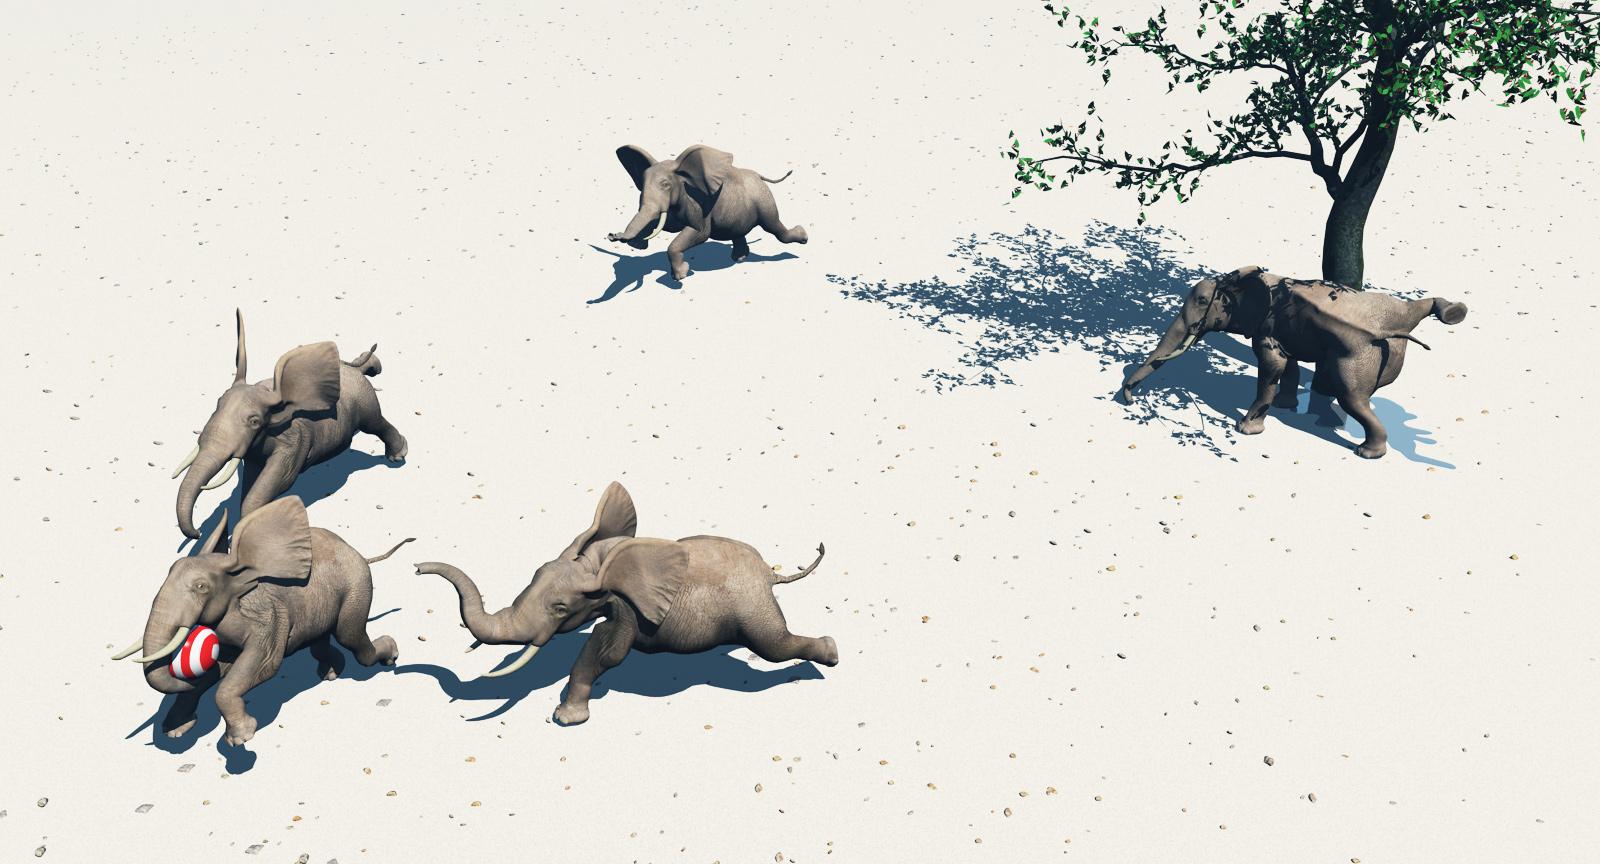 Gestern in der Kalahari